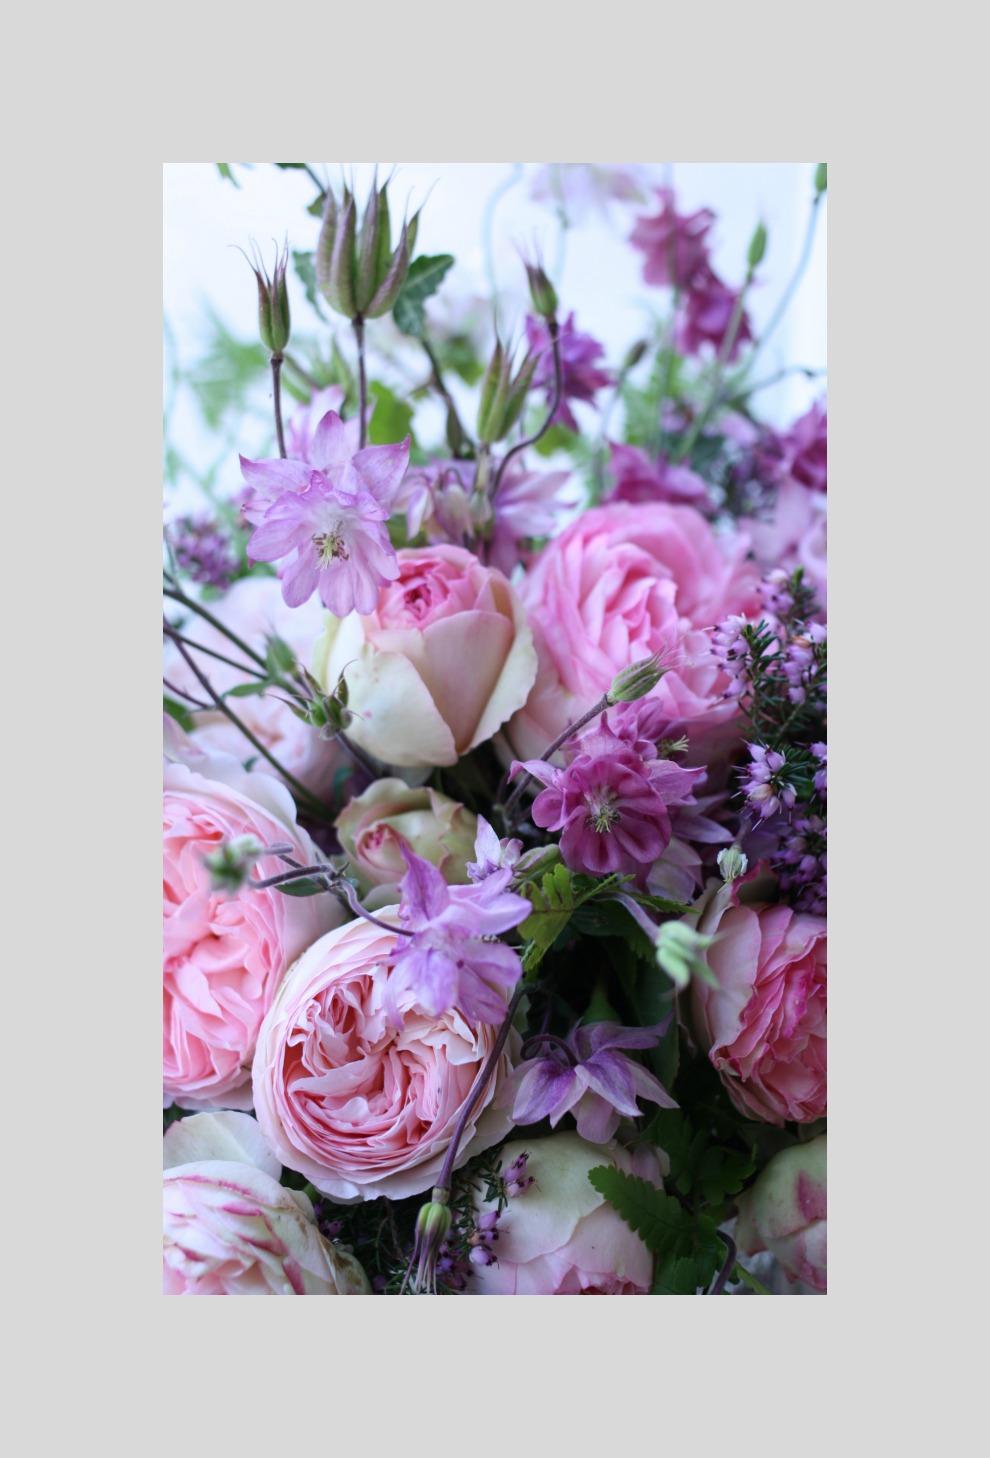 inside the bouquet